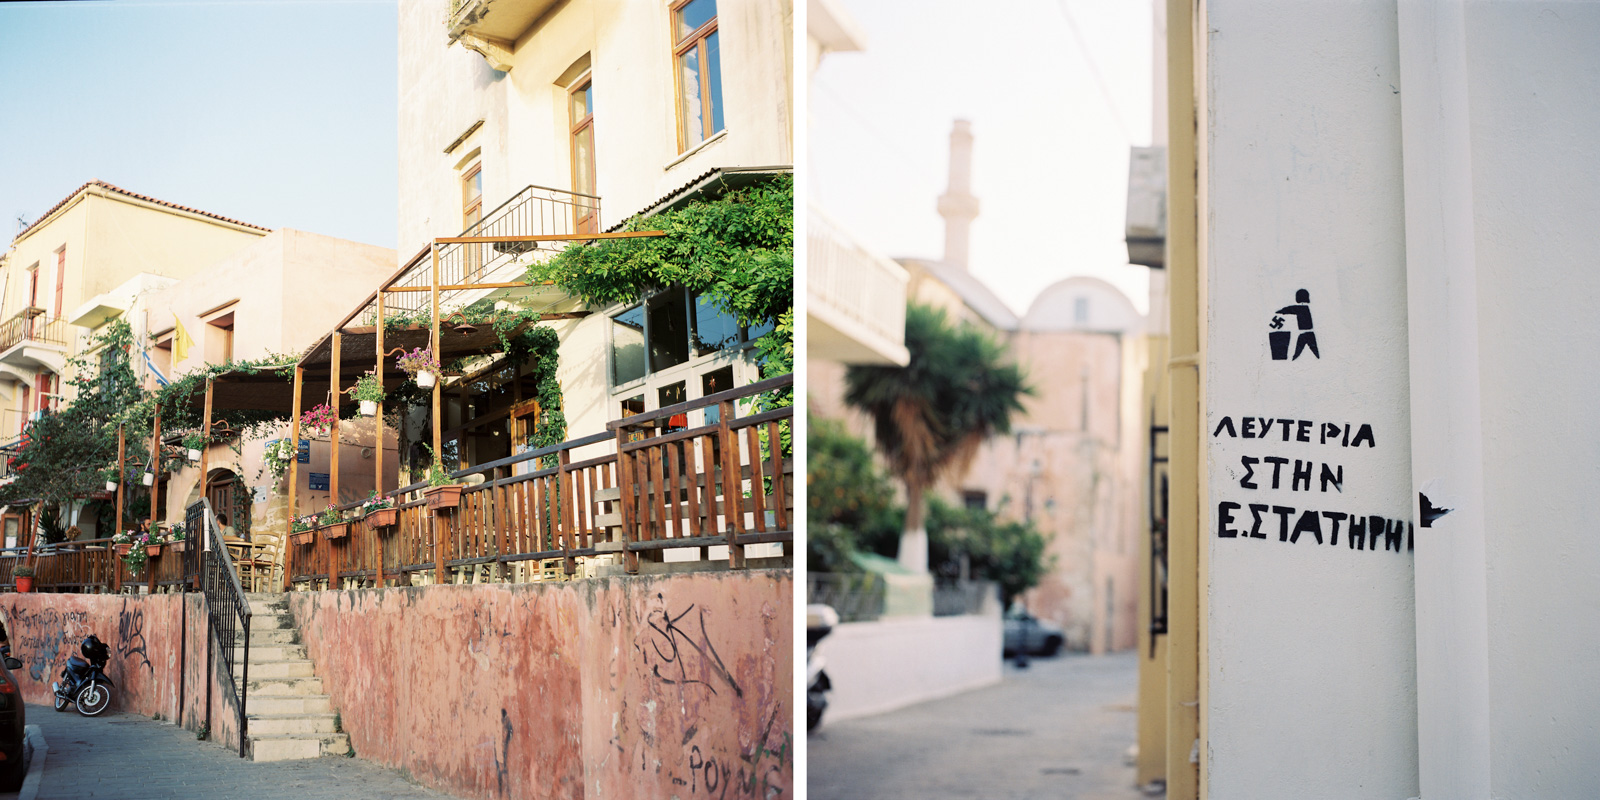 Greece_Yashicamat124g_21.jpg